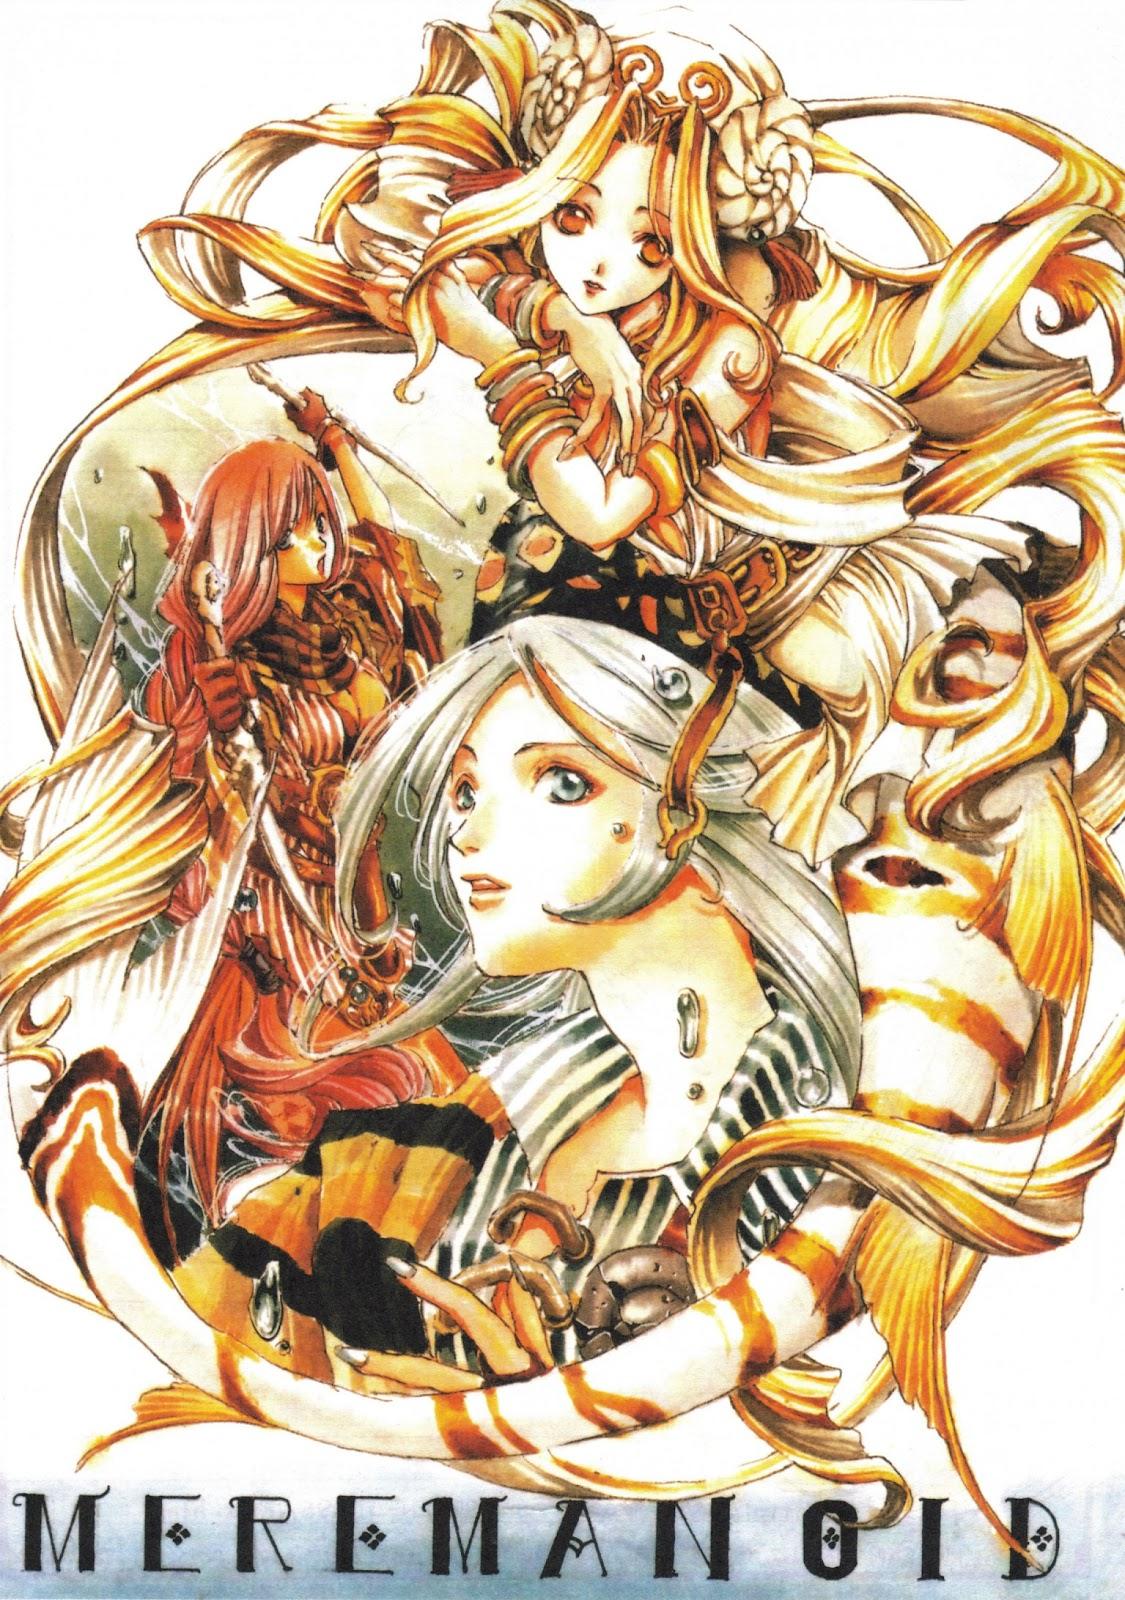 http://4.bp.blogspot.com/-q9uv3s952cc/UF6kAUEs1GI/AAAAAAAANks/-PefQ4NxiW8/s1600/memereriod+anime+wallpapers+mangaka+Tukiji+Nao.jpg